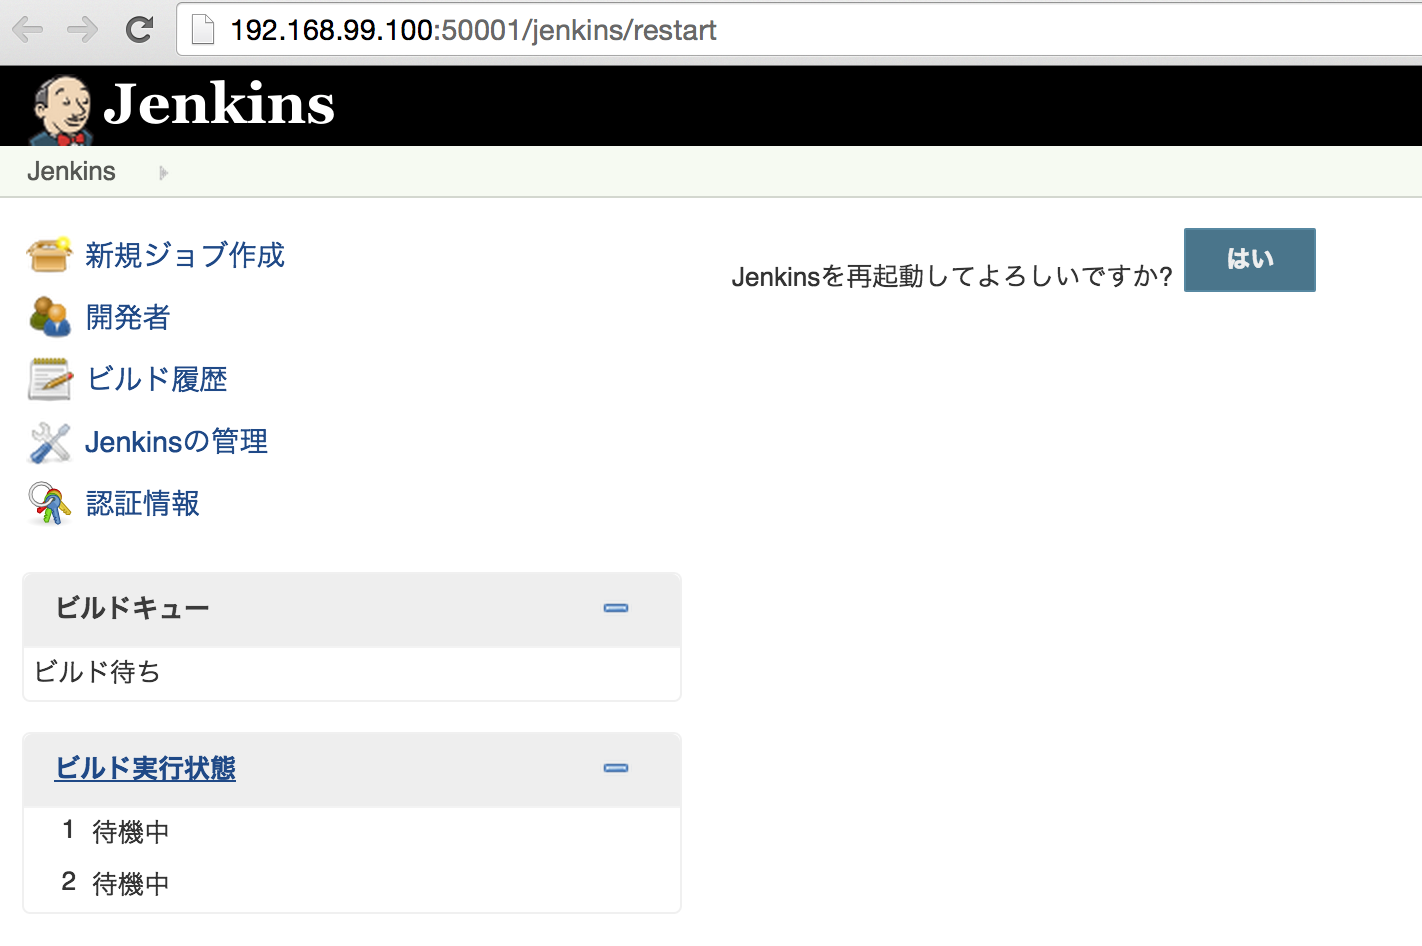 jenkins_restart.png